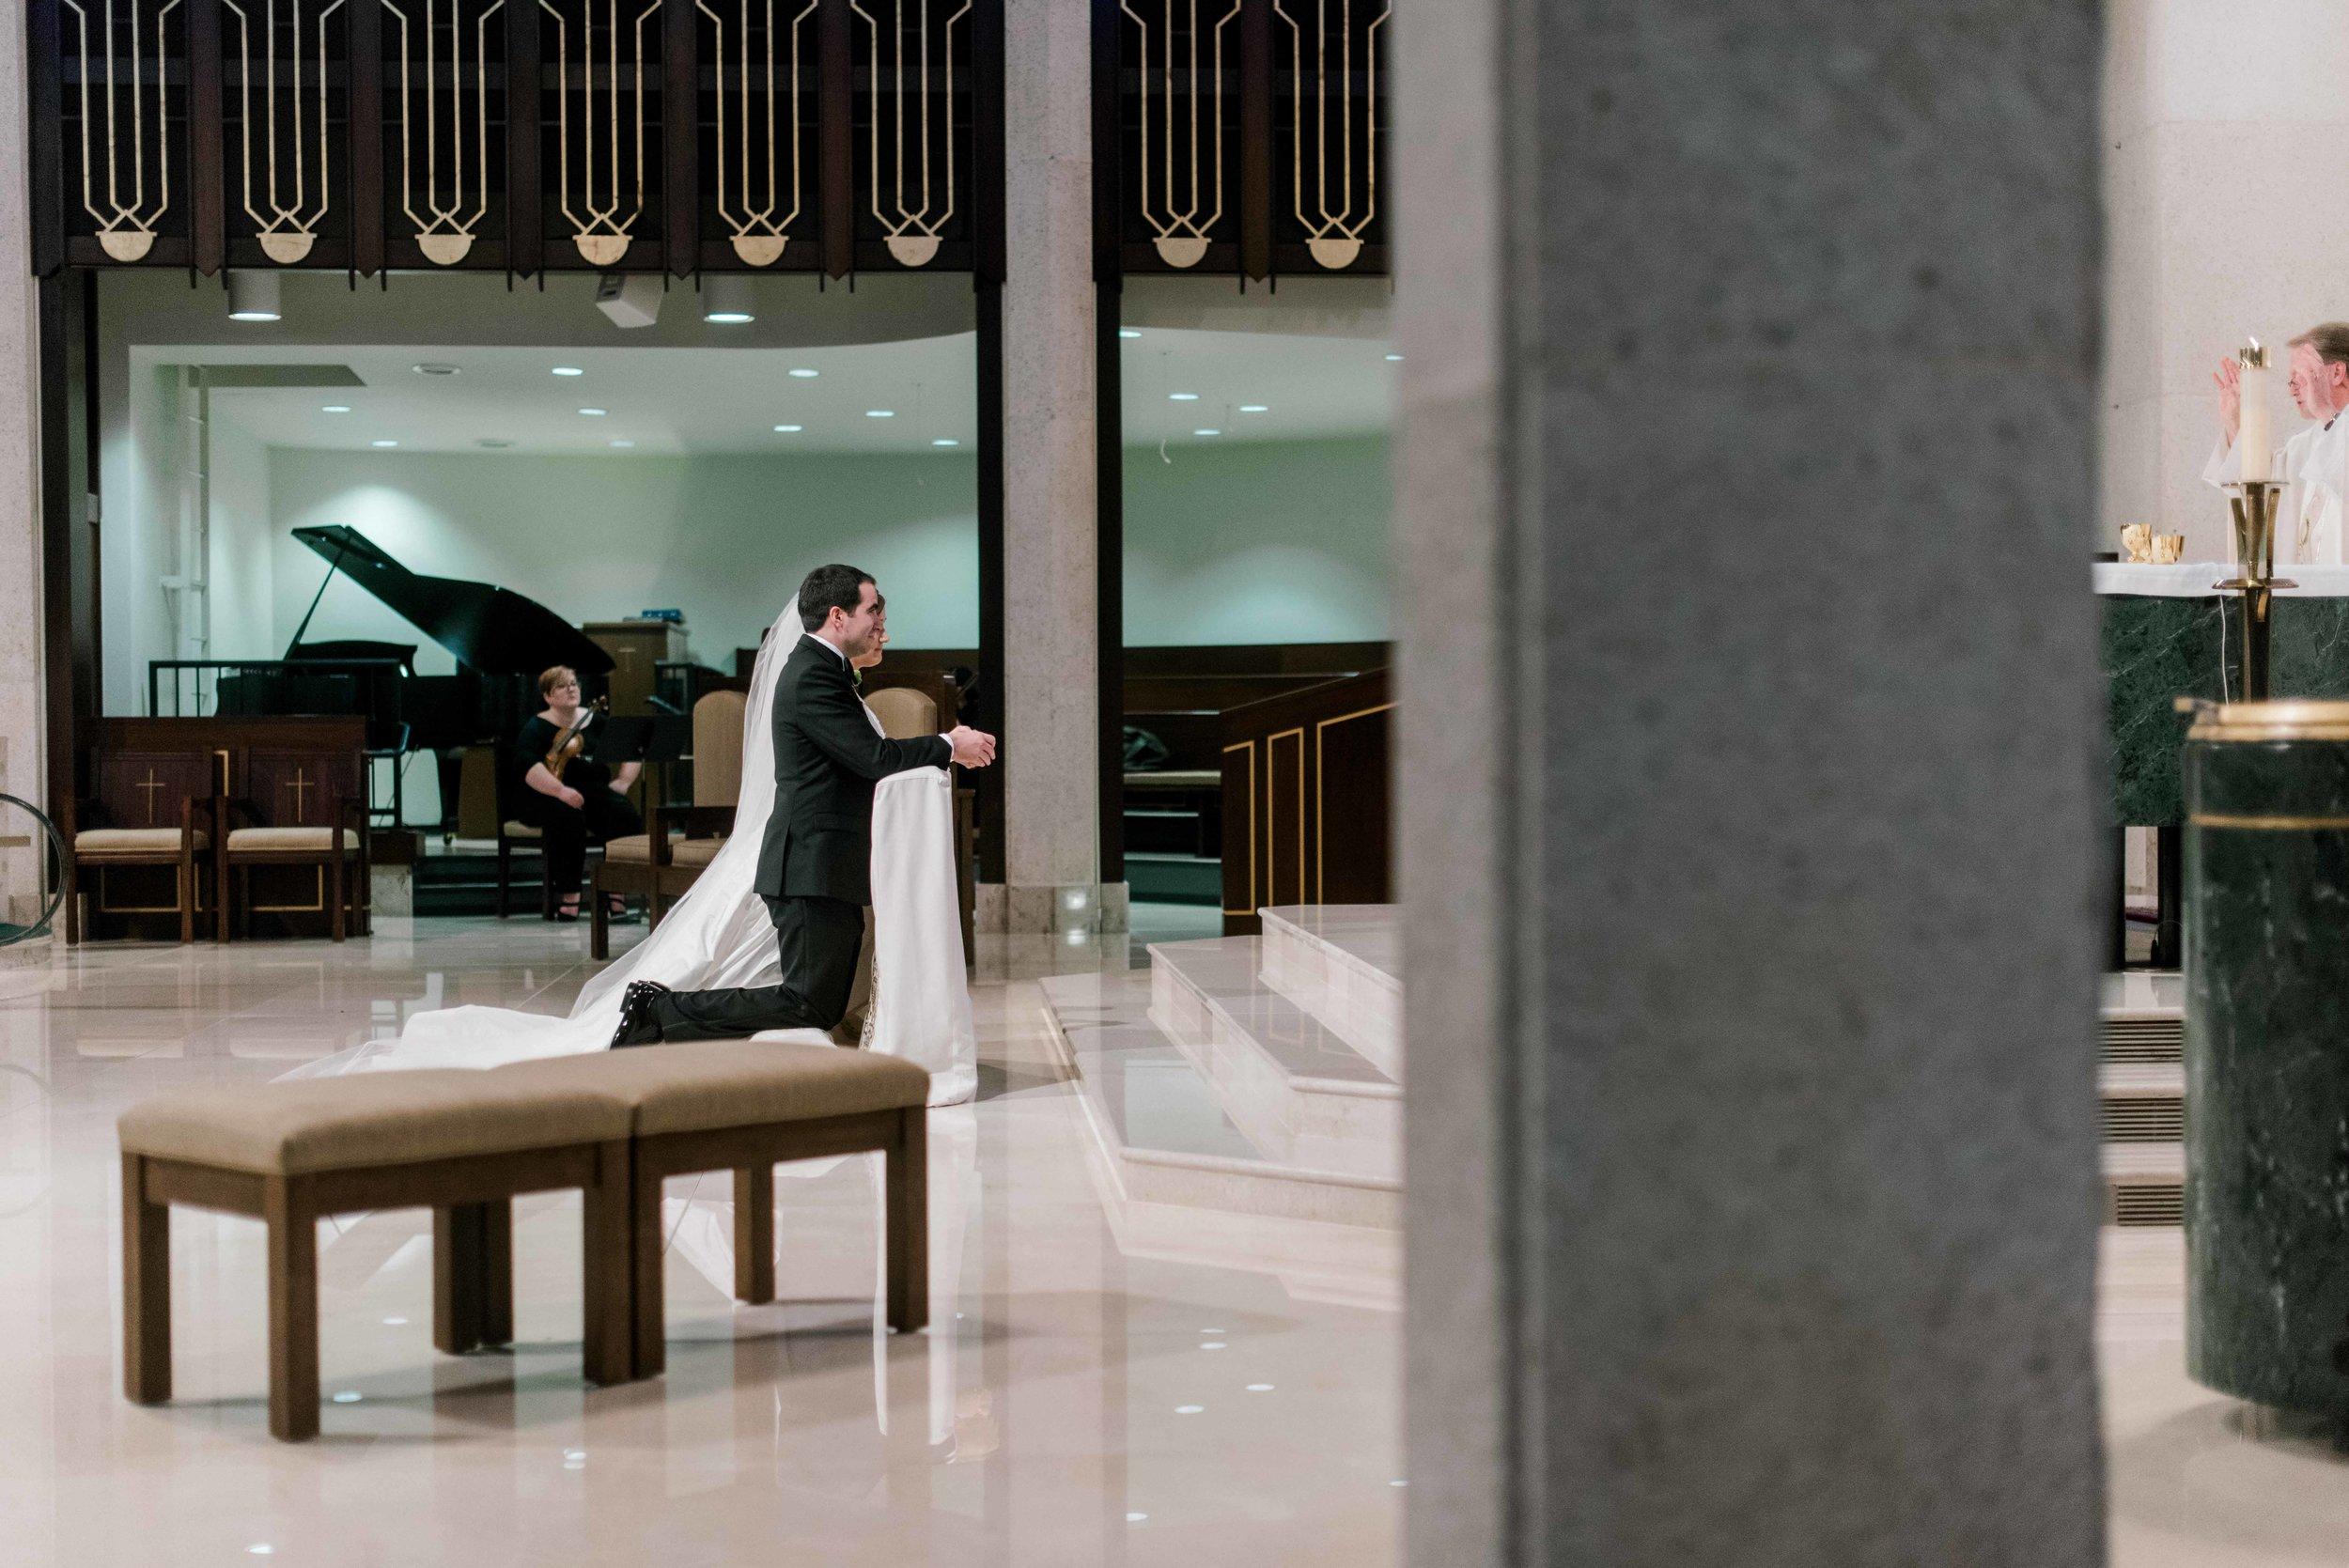 St-Michaels-Catholic-Church-Houston-Wedding-Ceremony-Josh-Dana-Fernandez-Photographer-Destination-Austin-Dallas-Fine-Art-Film-4.jpg